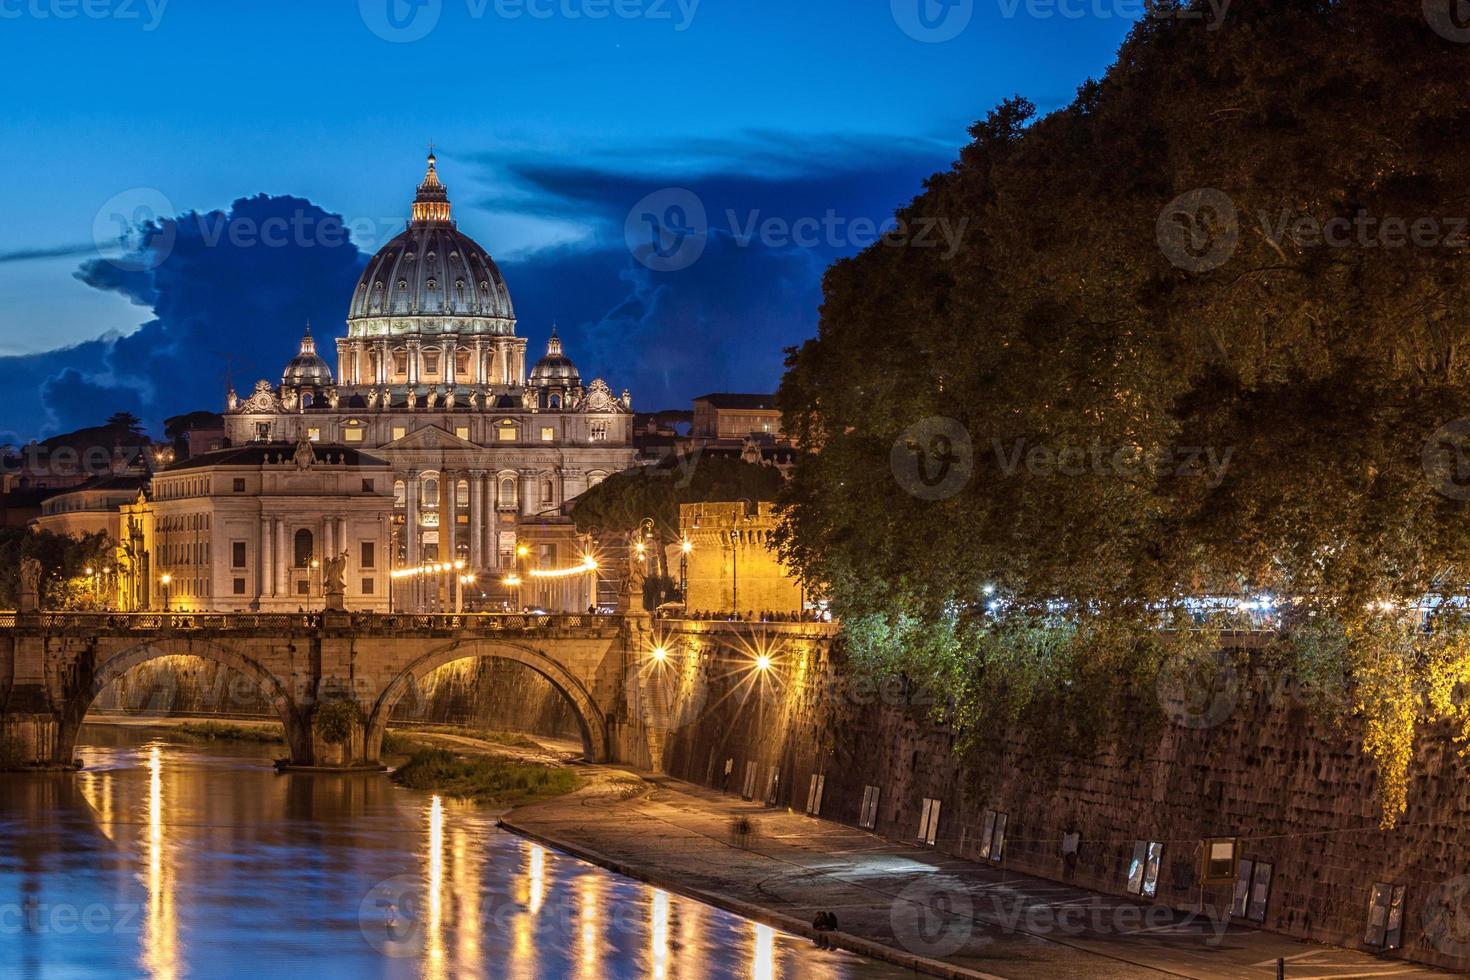 st. peter's basiliek 's nachts in rome, italië foto